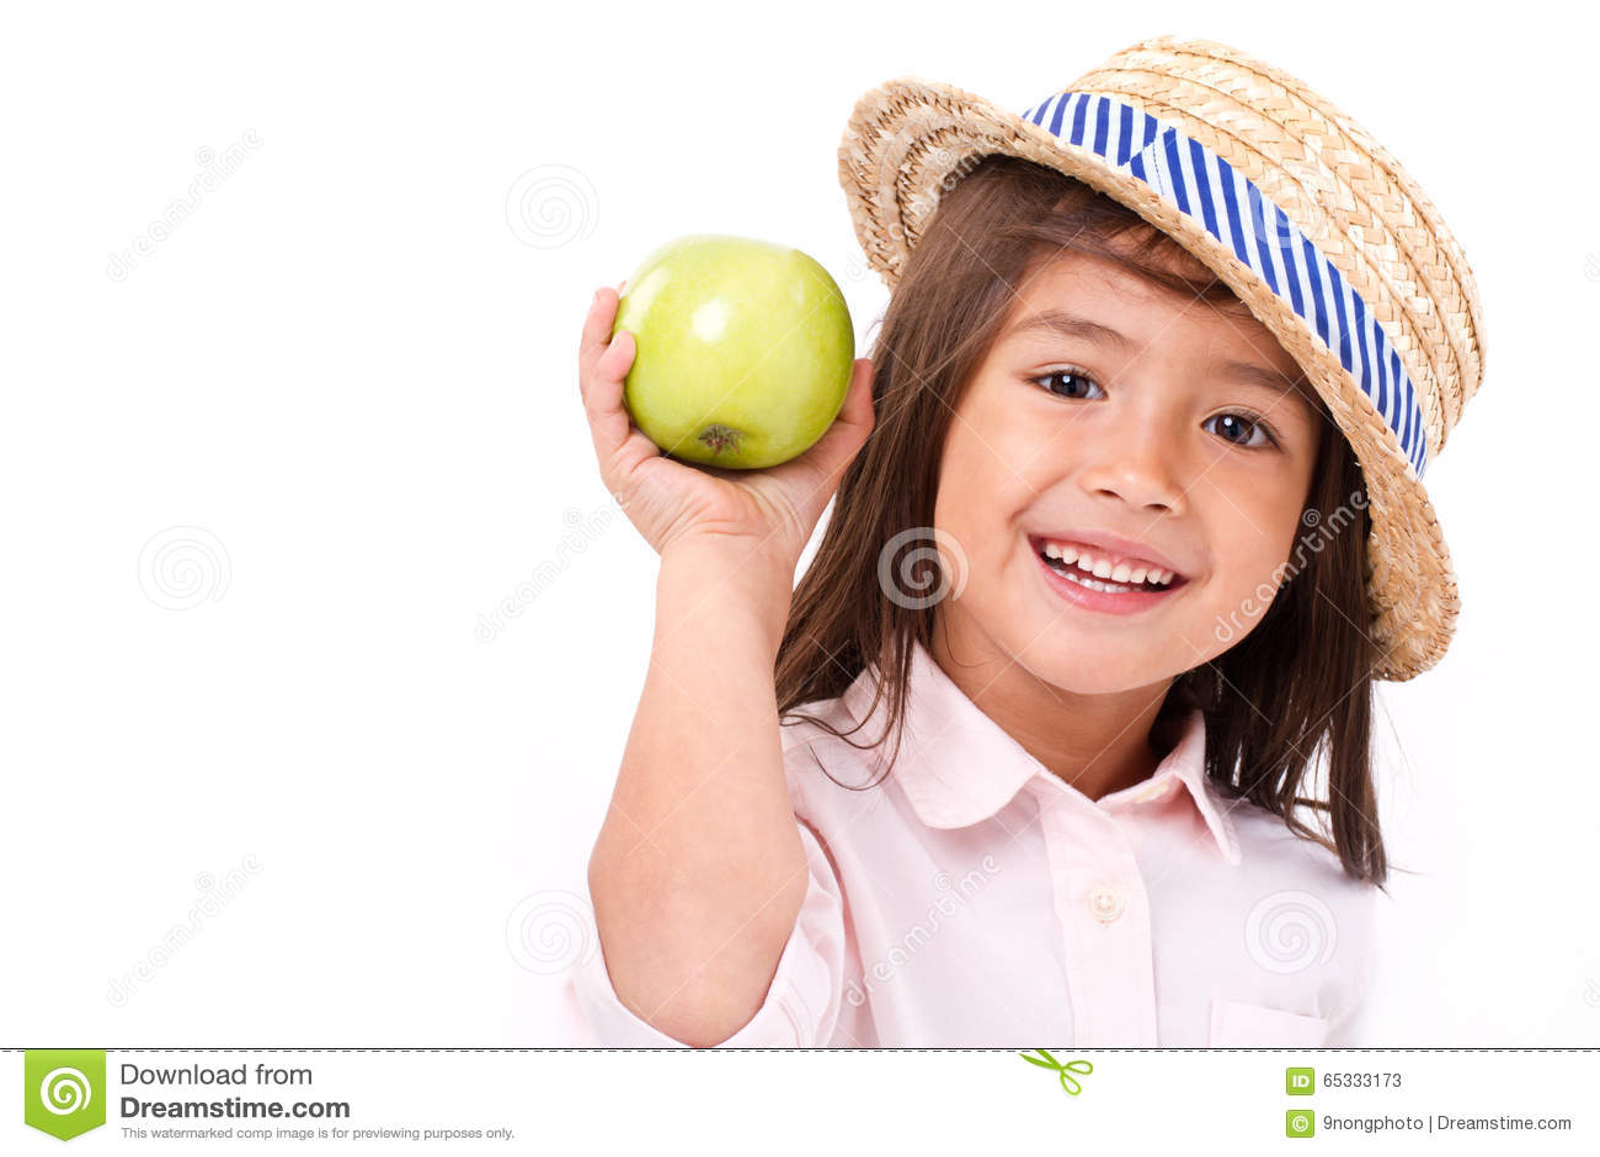 Cute little girl, hand holding green apple